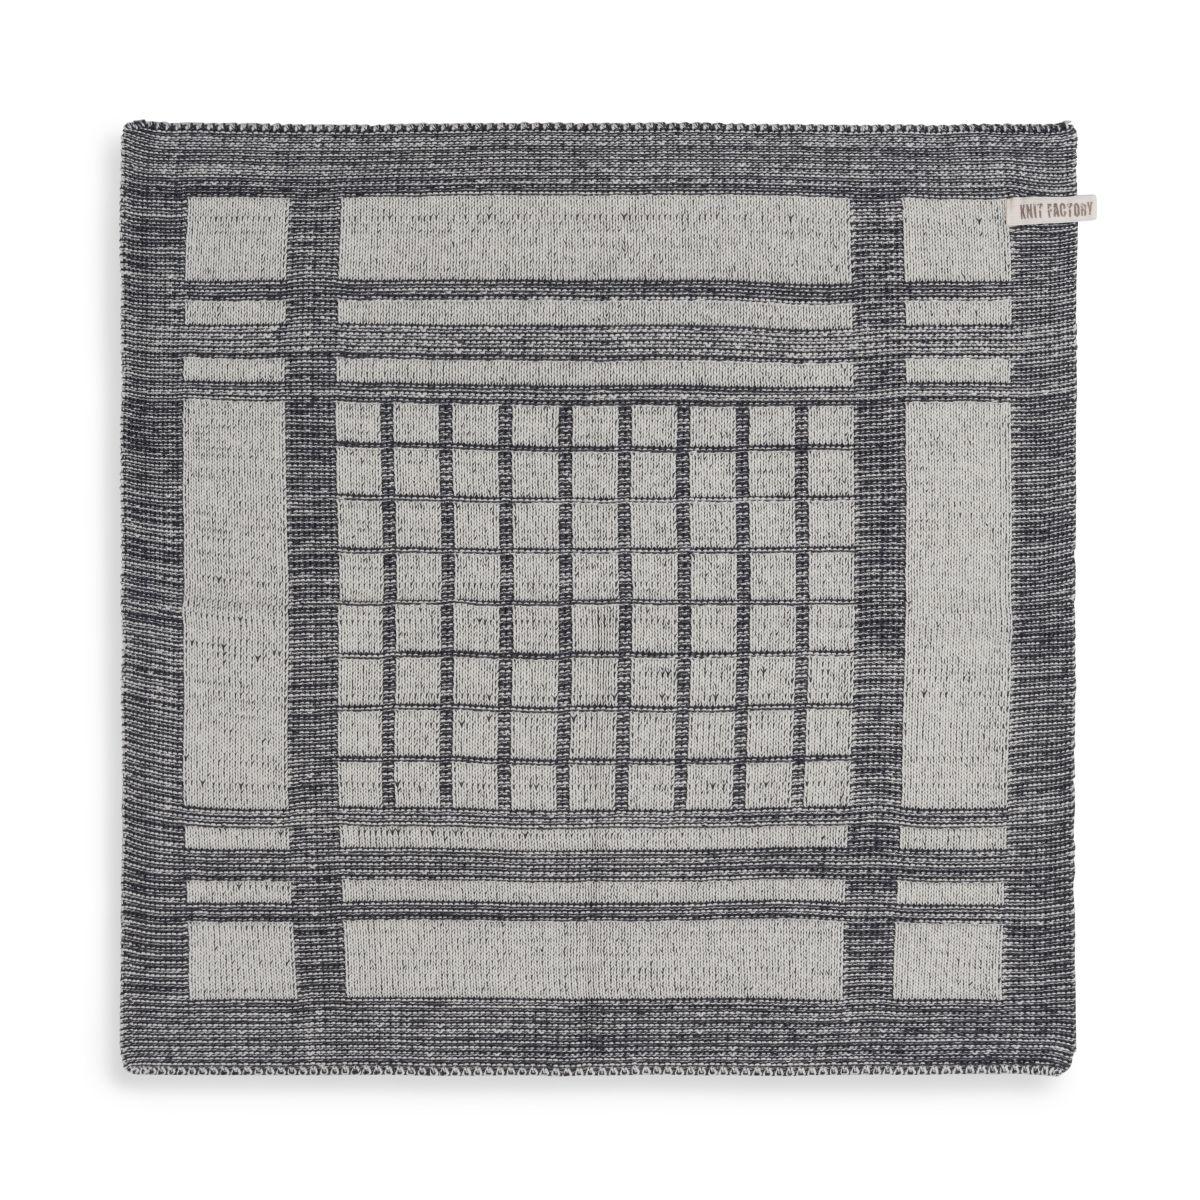 knit factory 2180070 keukendoek emma ecru antraciet 1